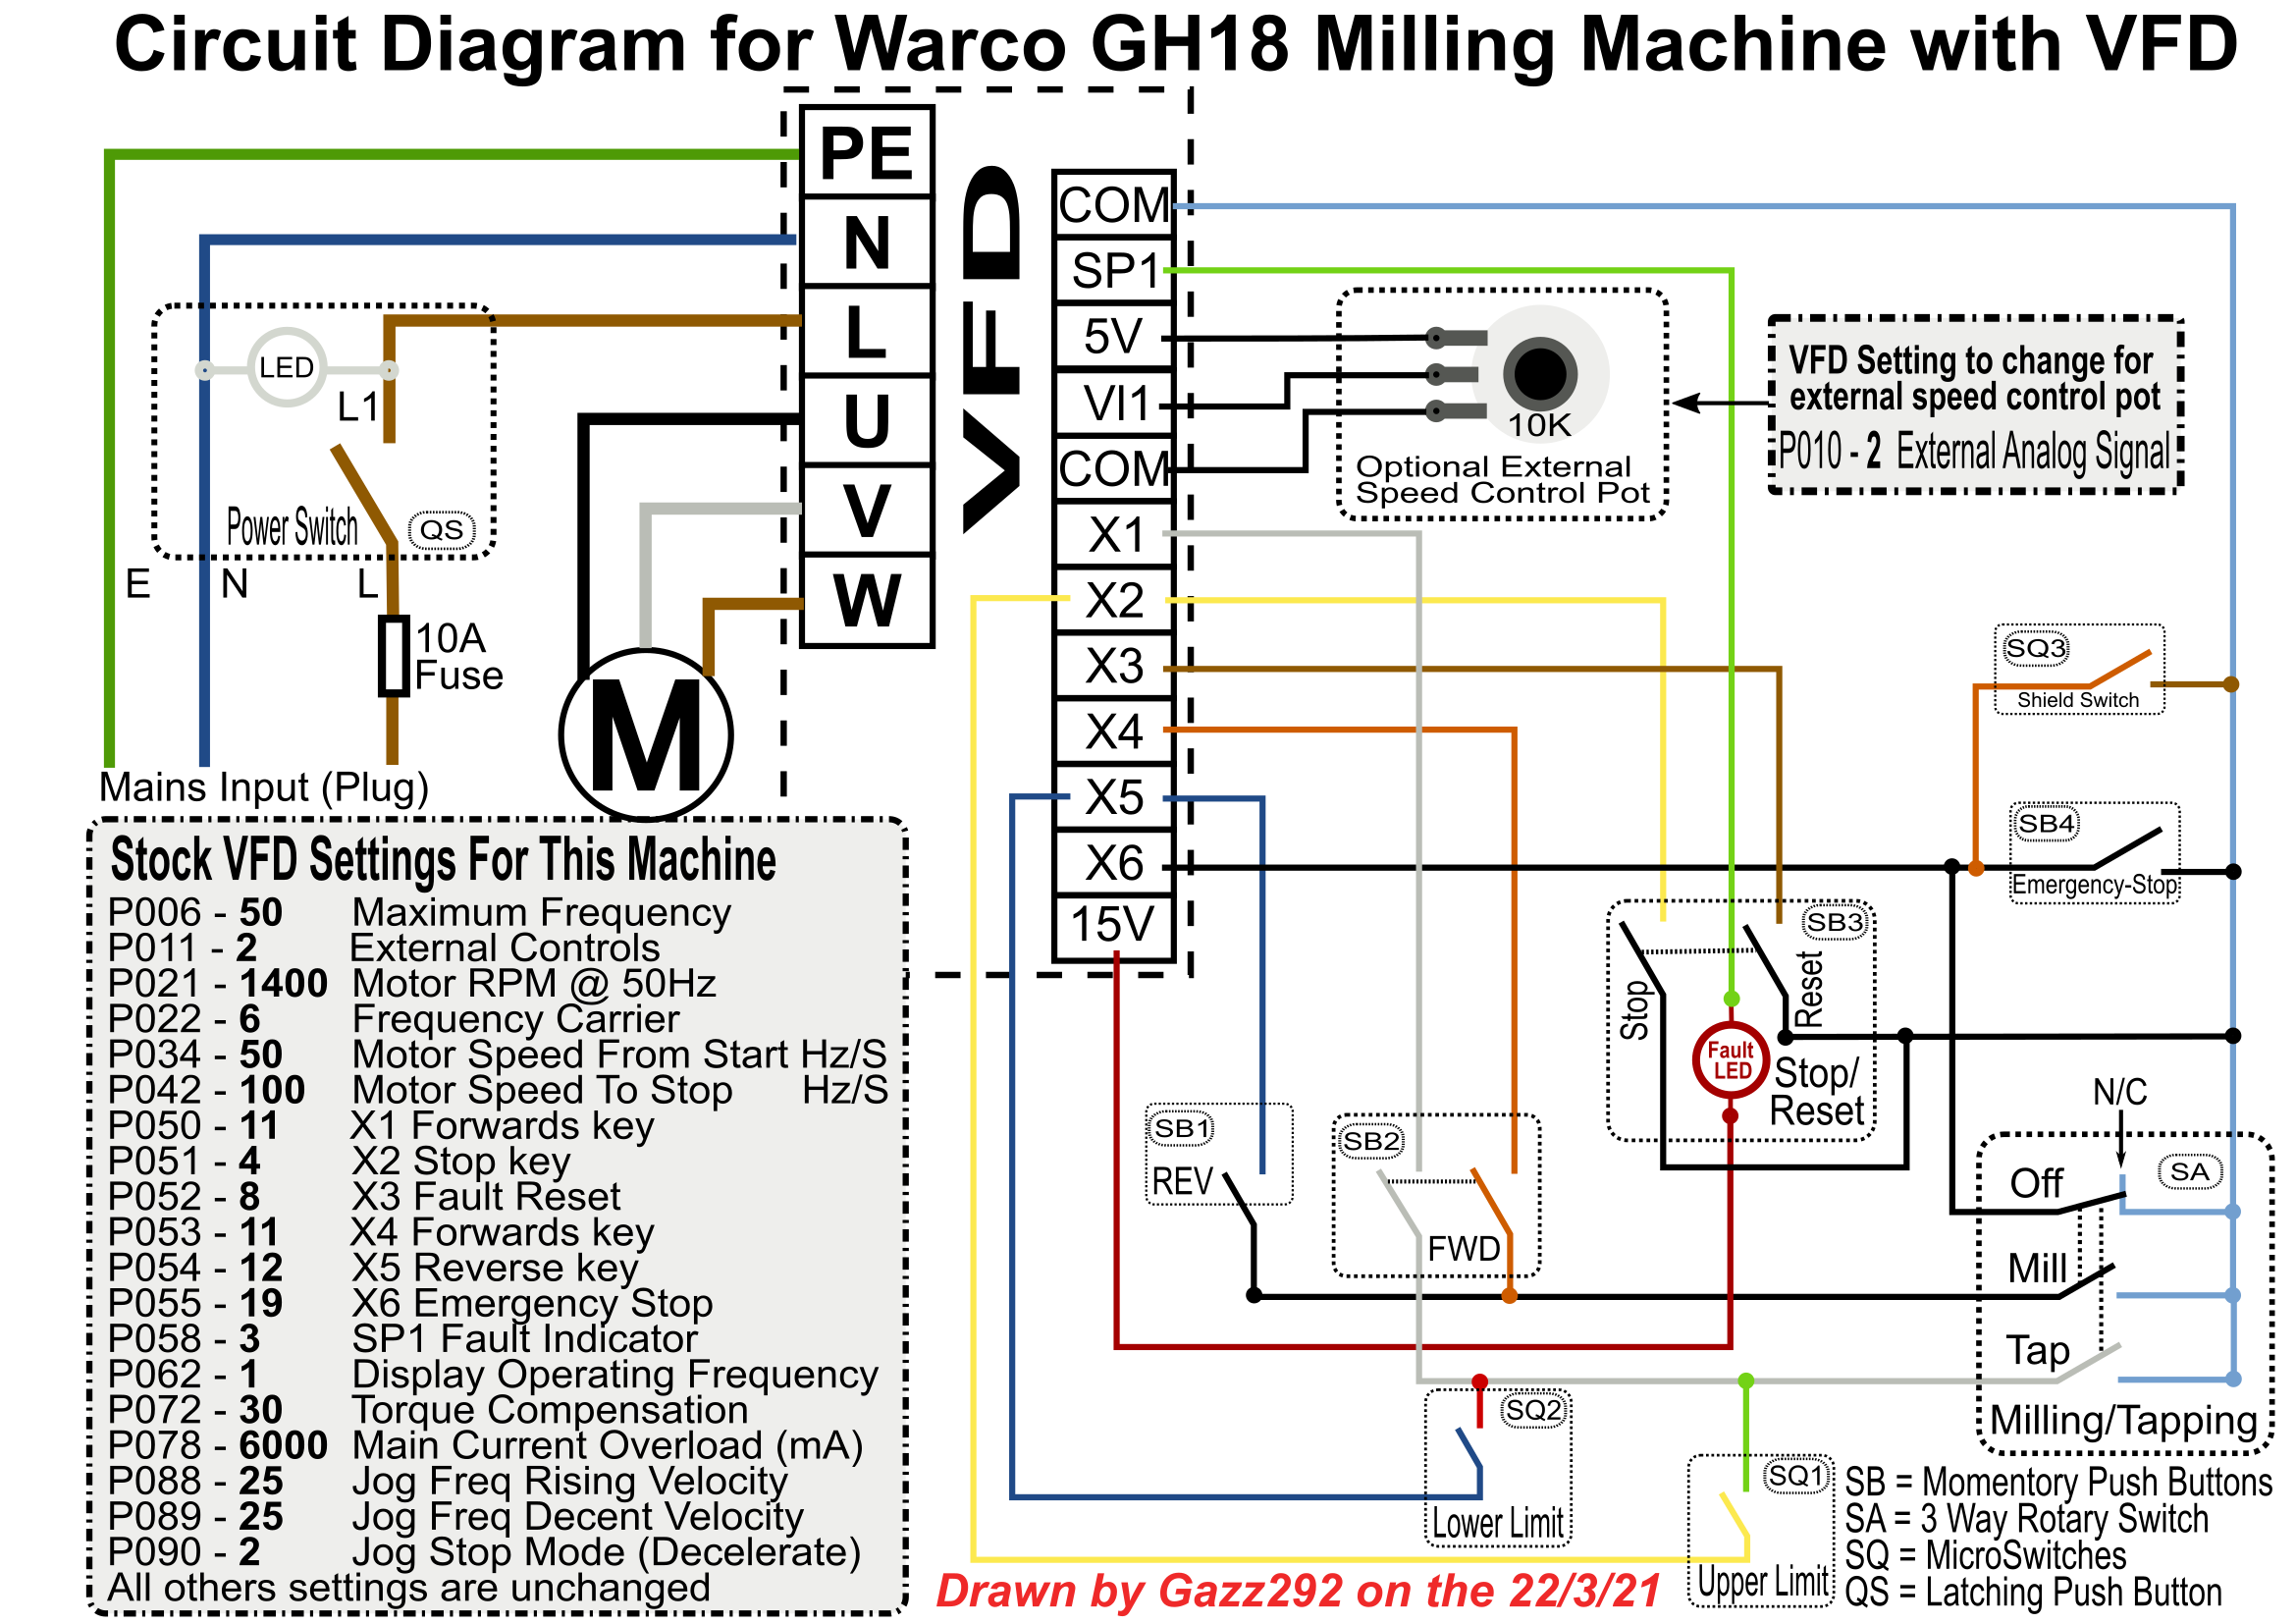 Warco GH18 Wiring Diagram